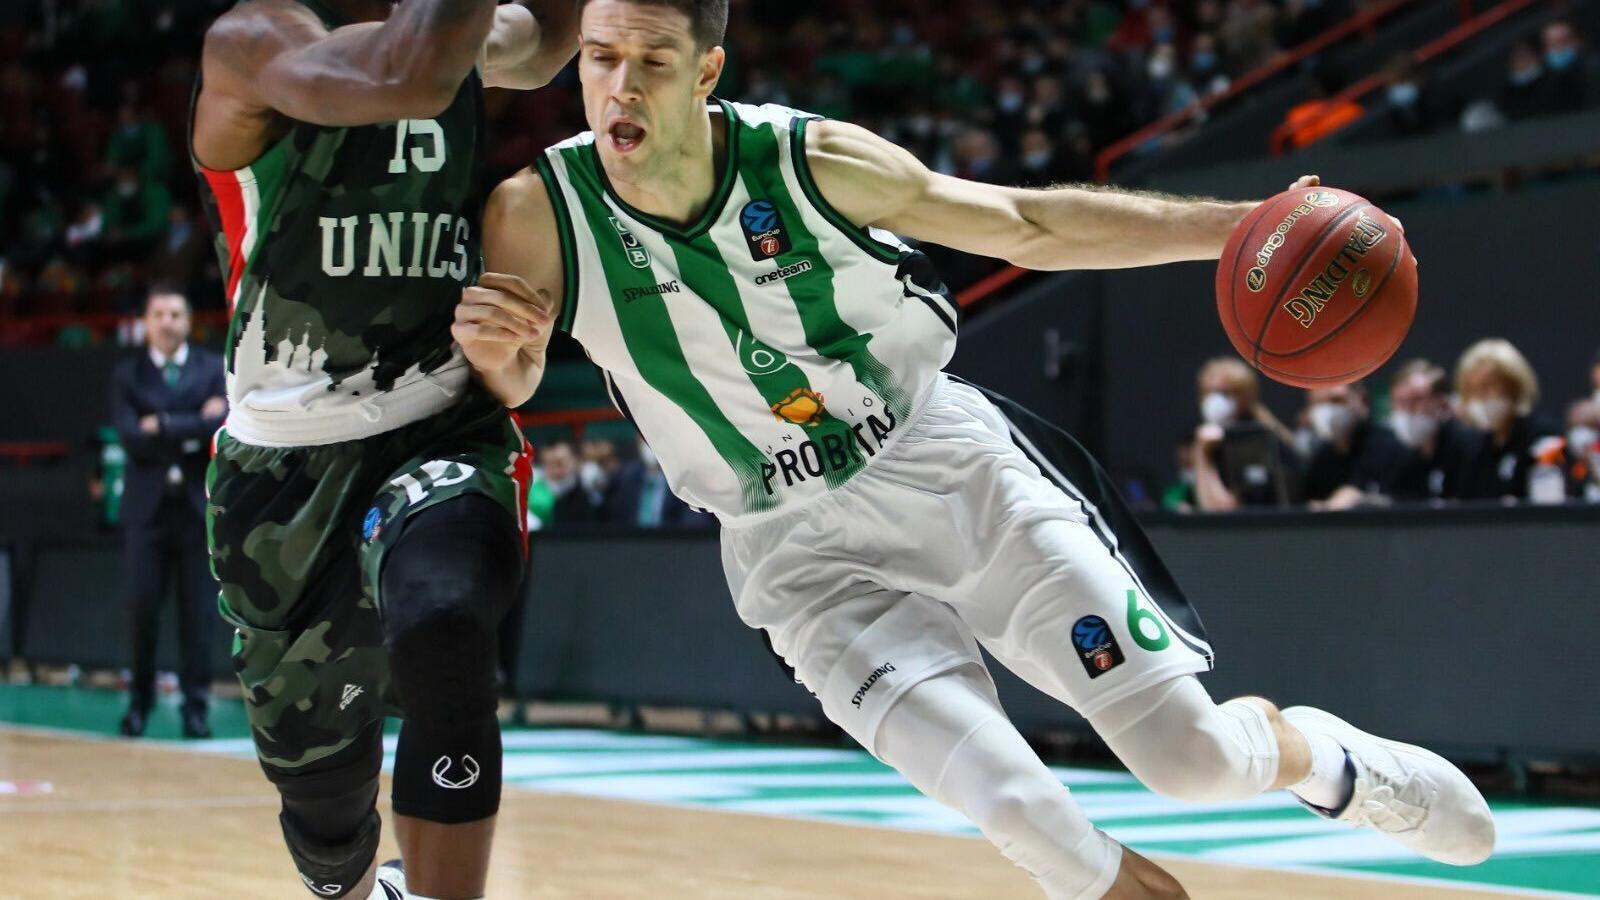 Xabi López-Arostegui